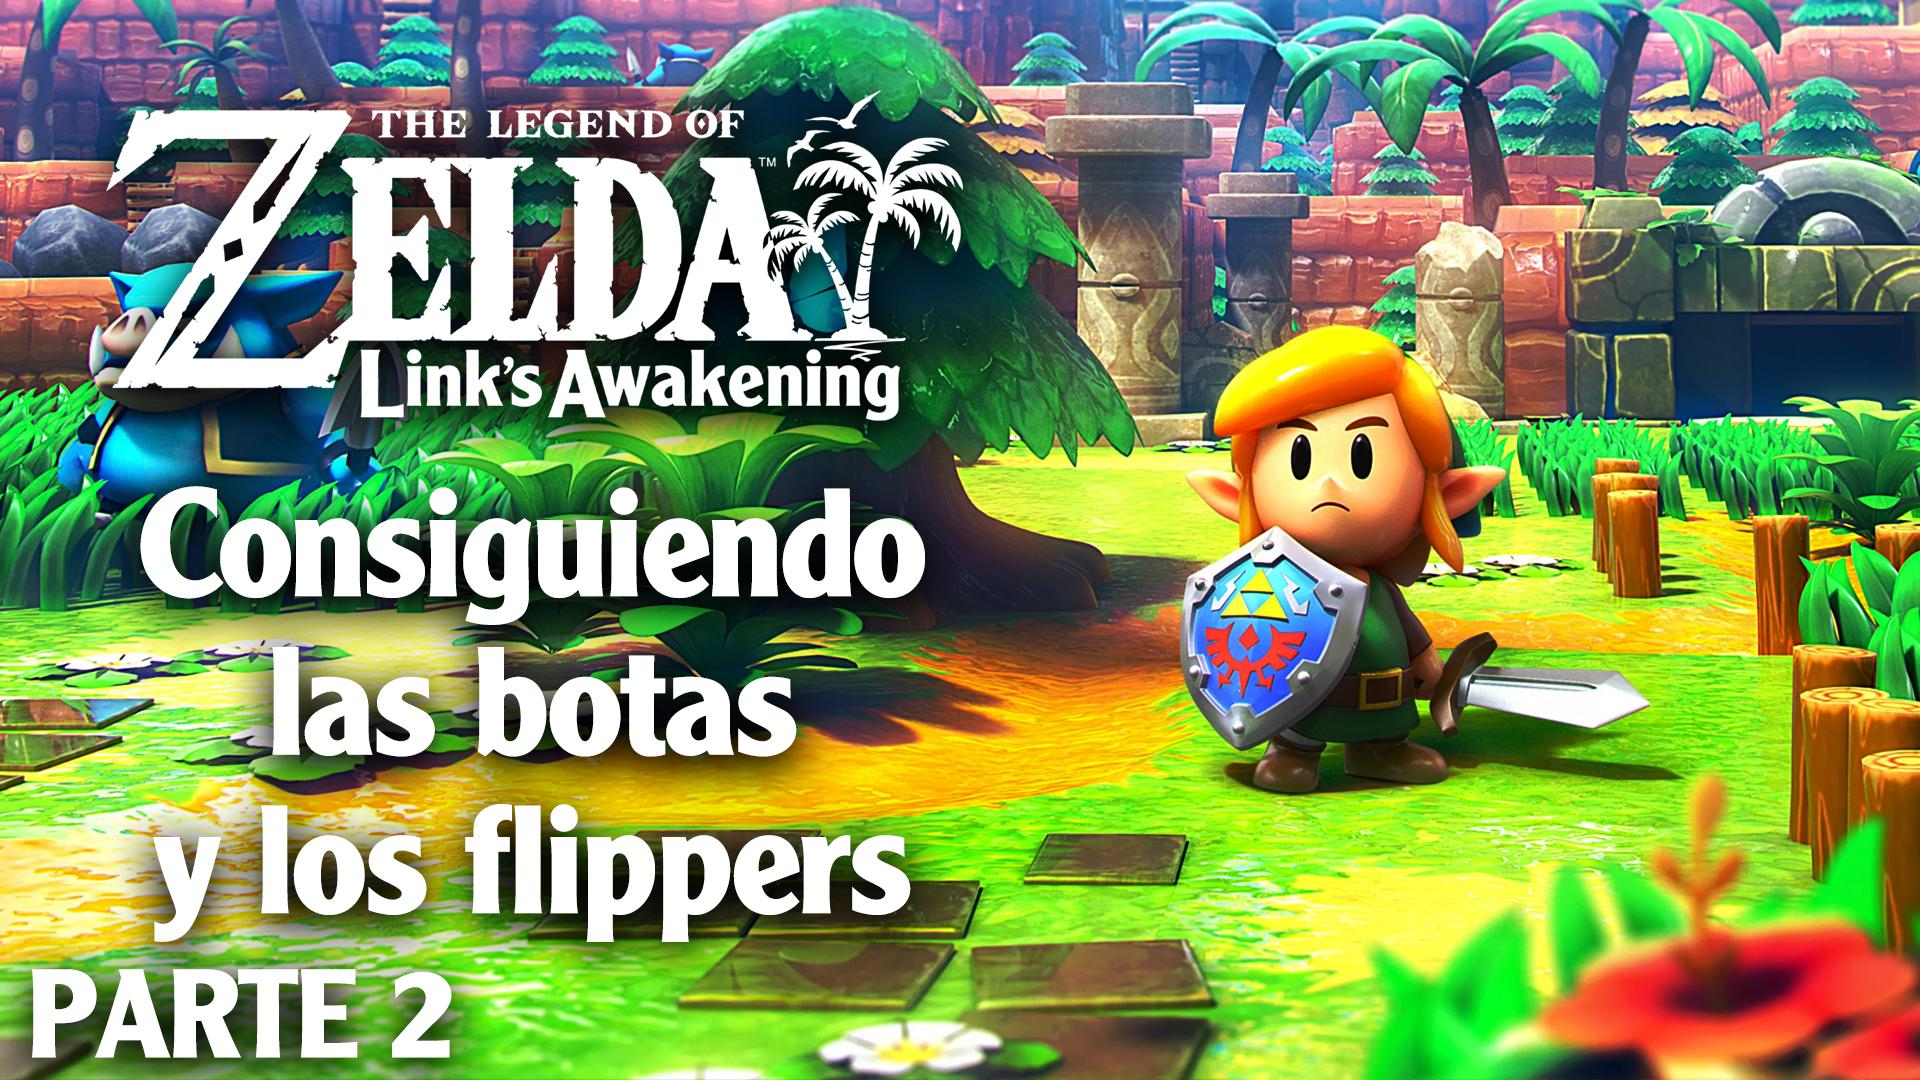 Serie The Legend of Zelda  Link's Awakening #02 – Consiguiendo las botas y los flippers